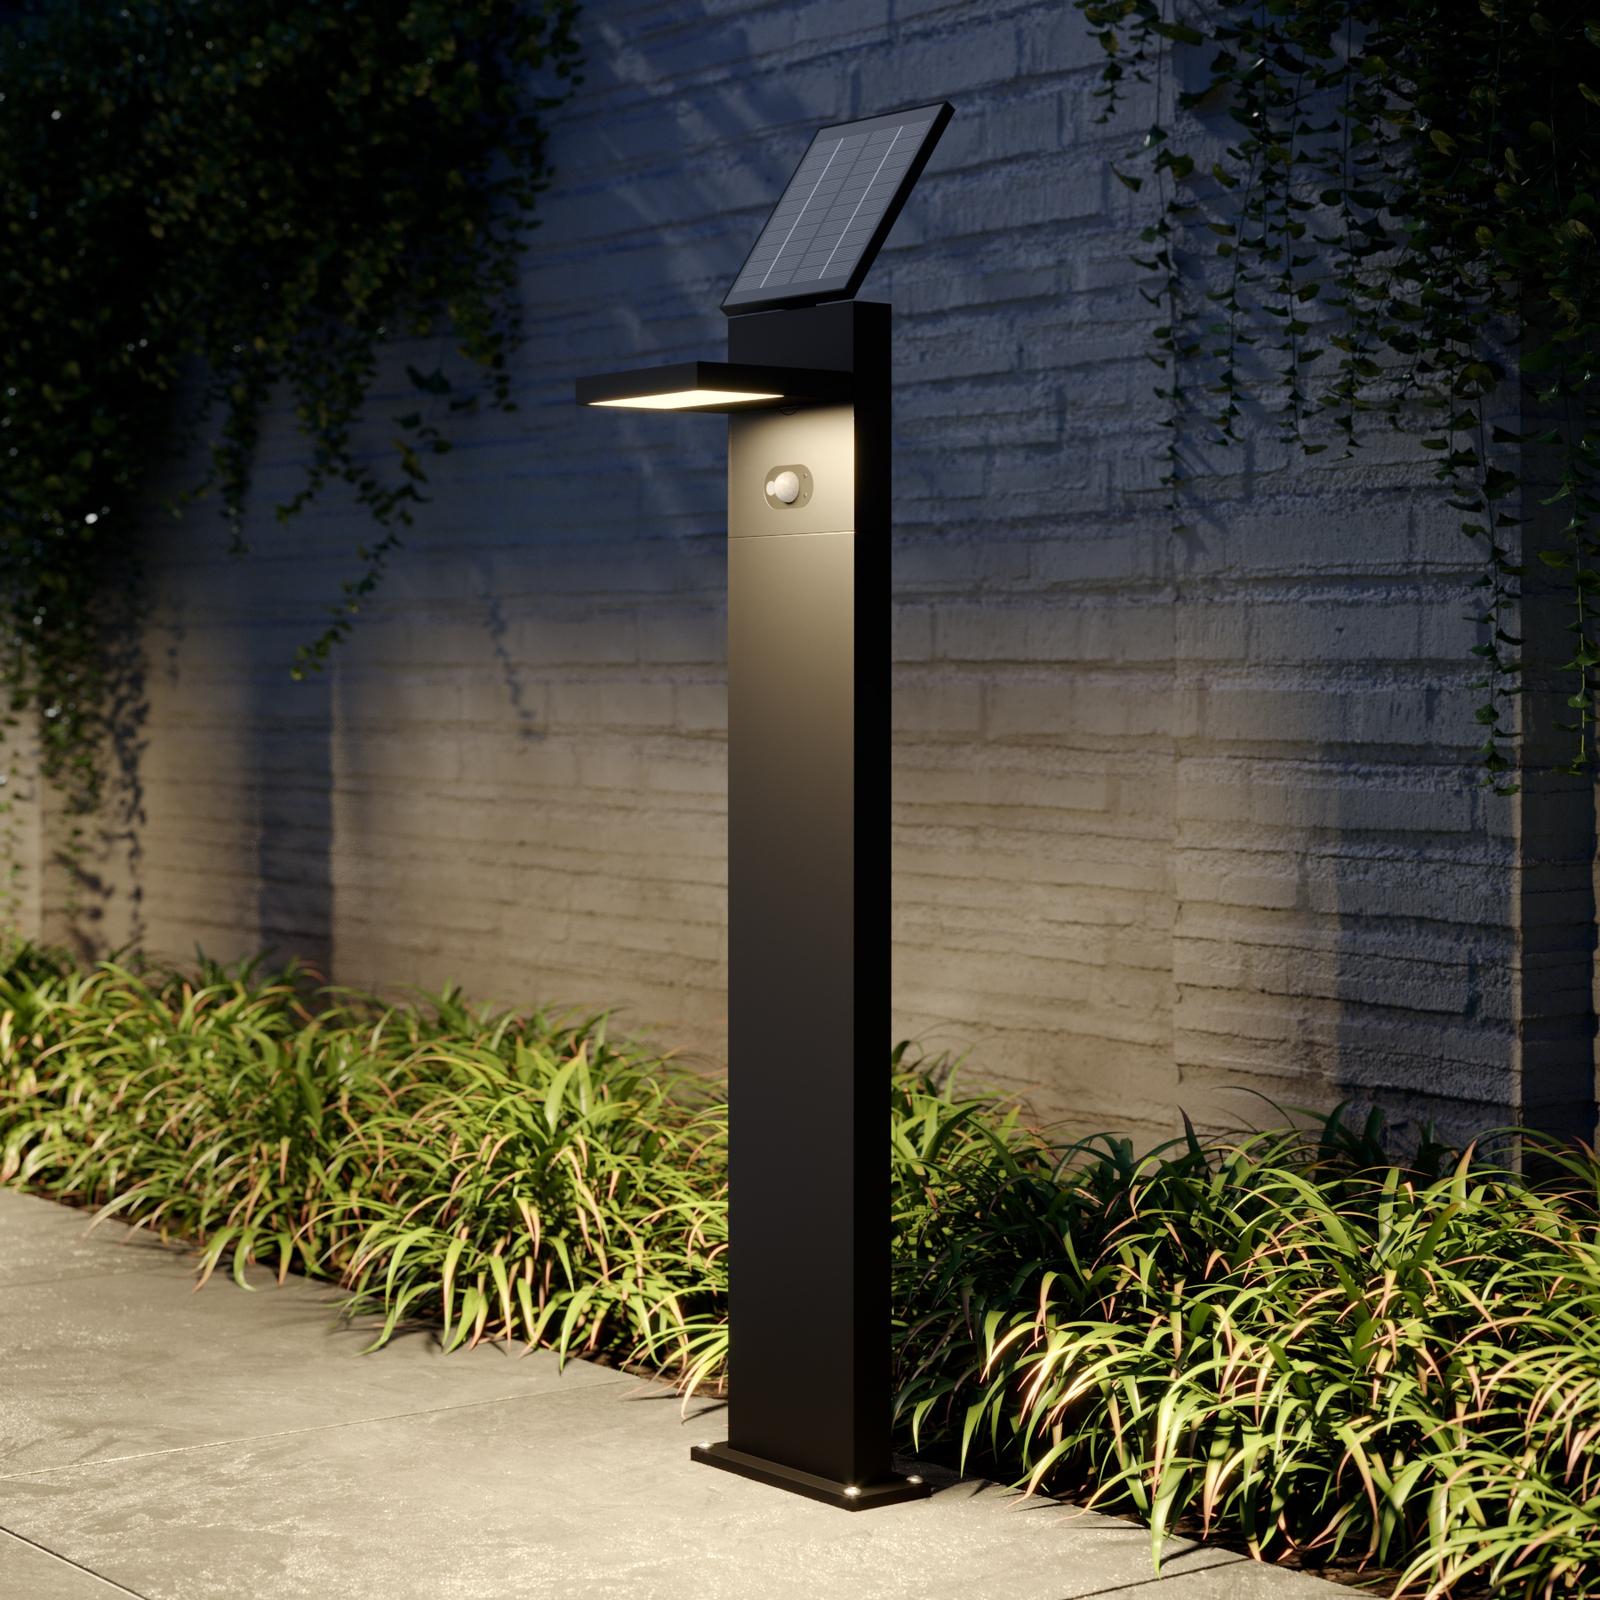 Solarny słupek oświetleniowy LED Silvan, 100 cm